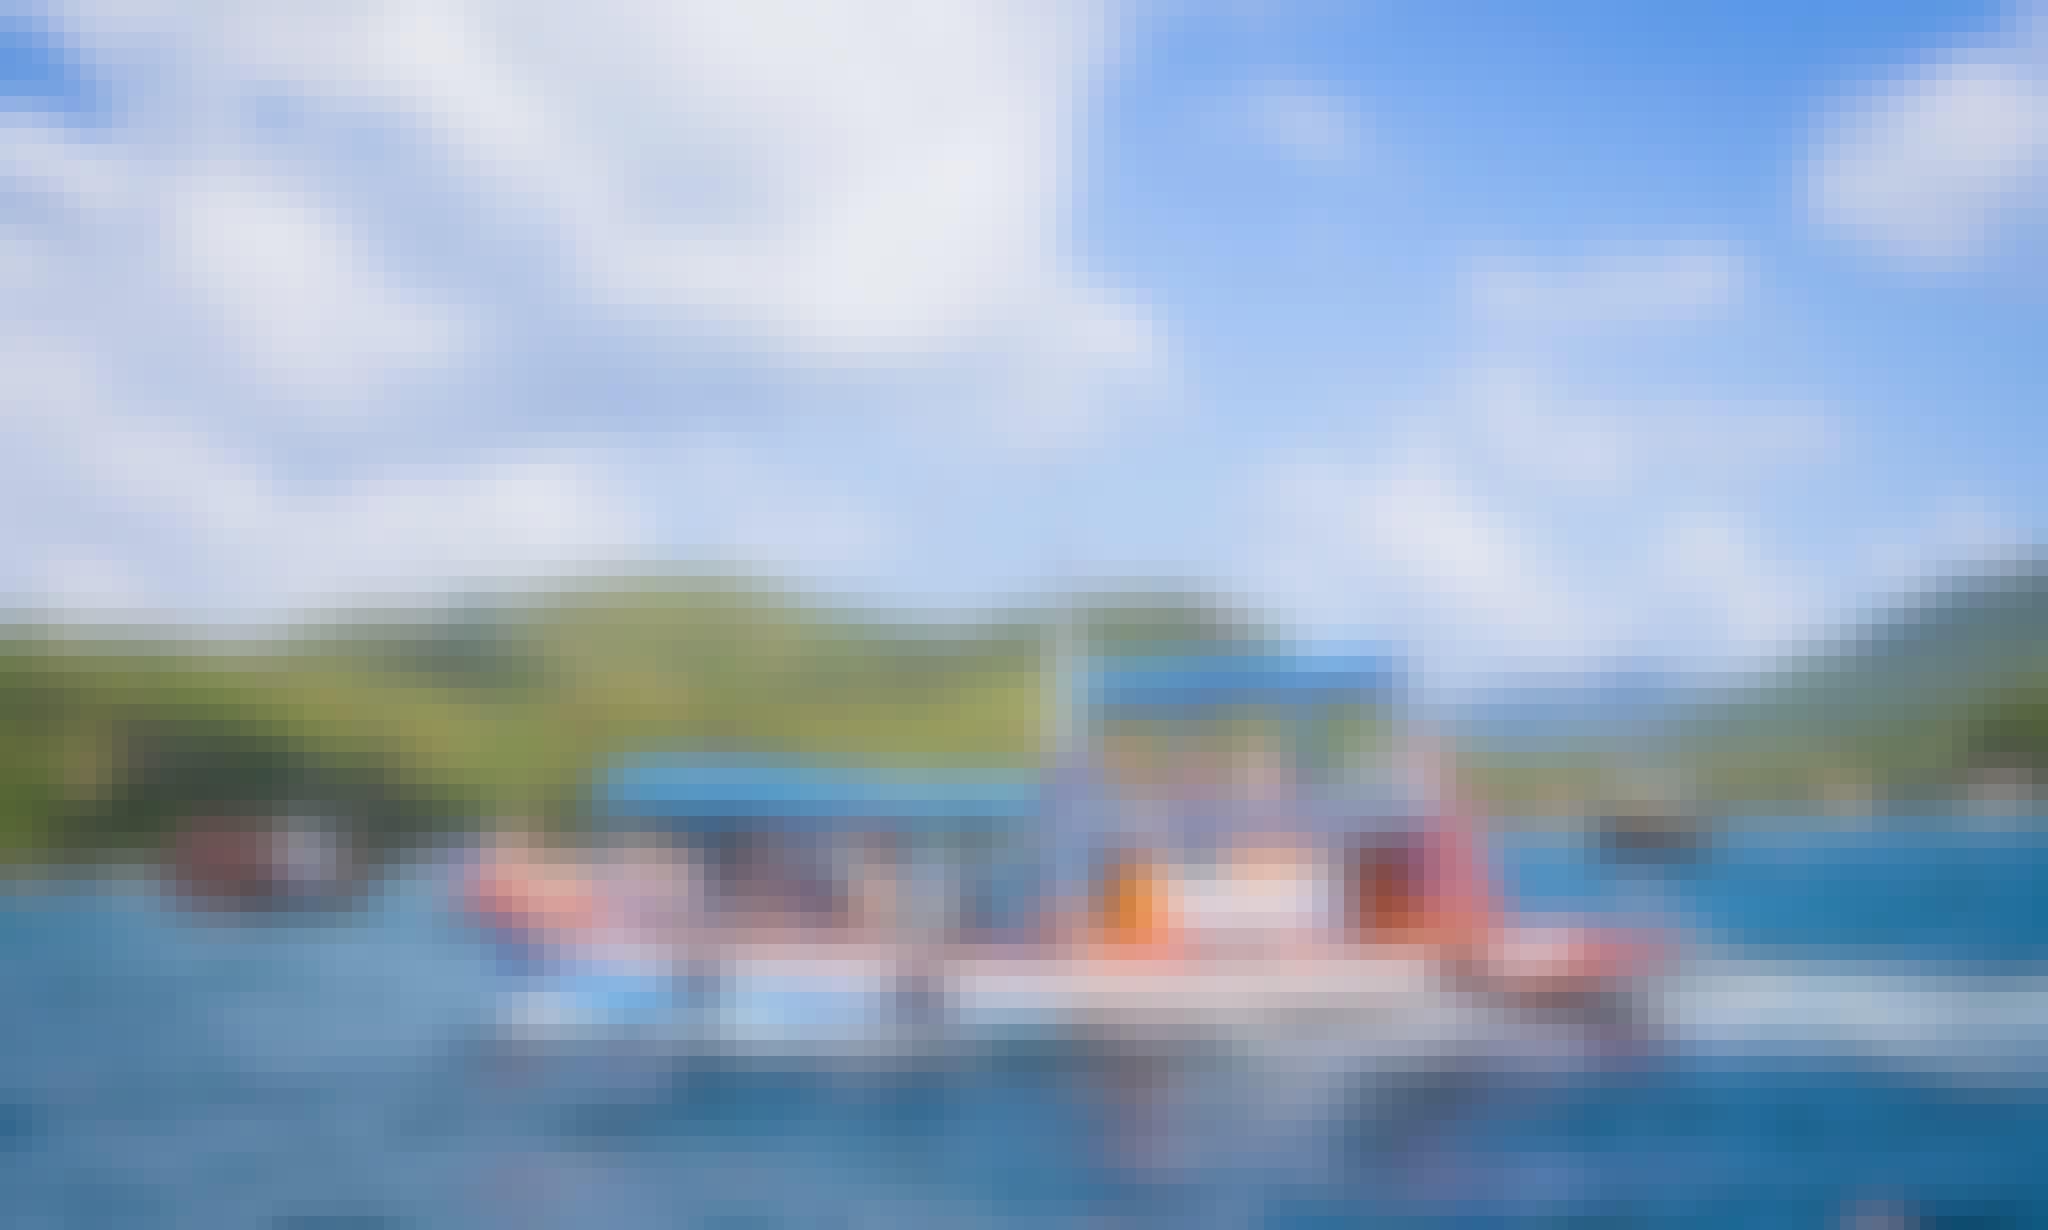 Chon Saran Phorn Boat Snorkeling Tours in Tambon Ko Tao